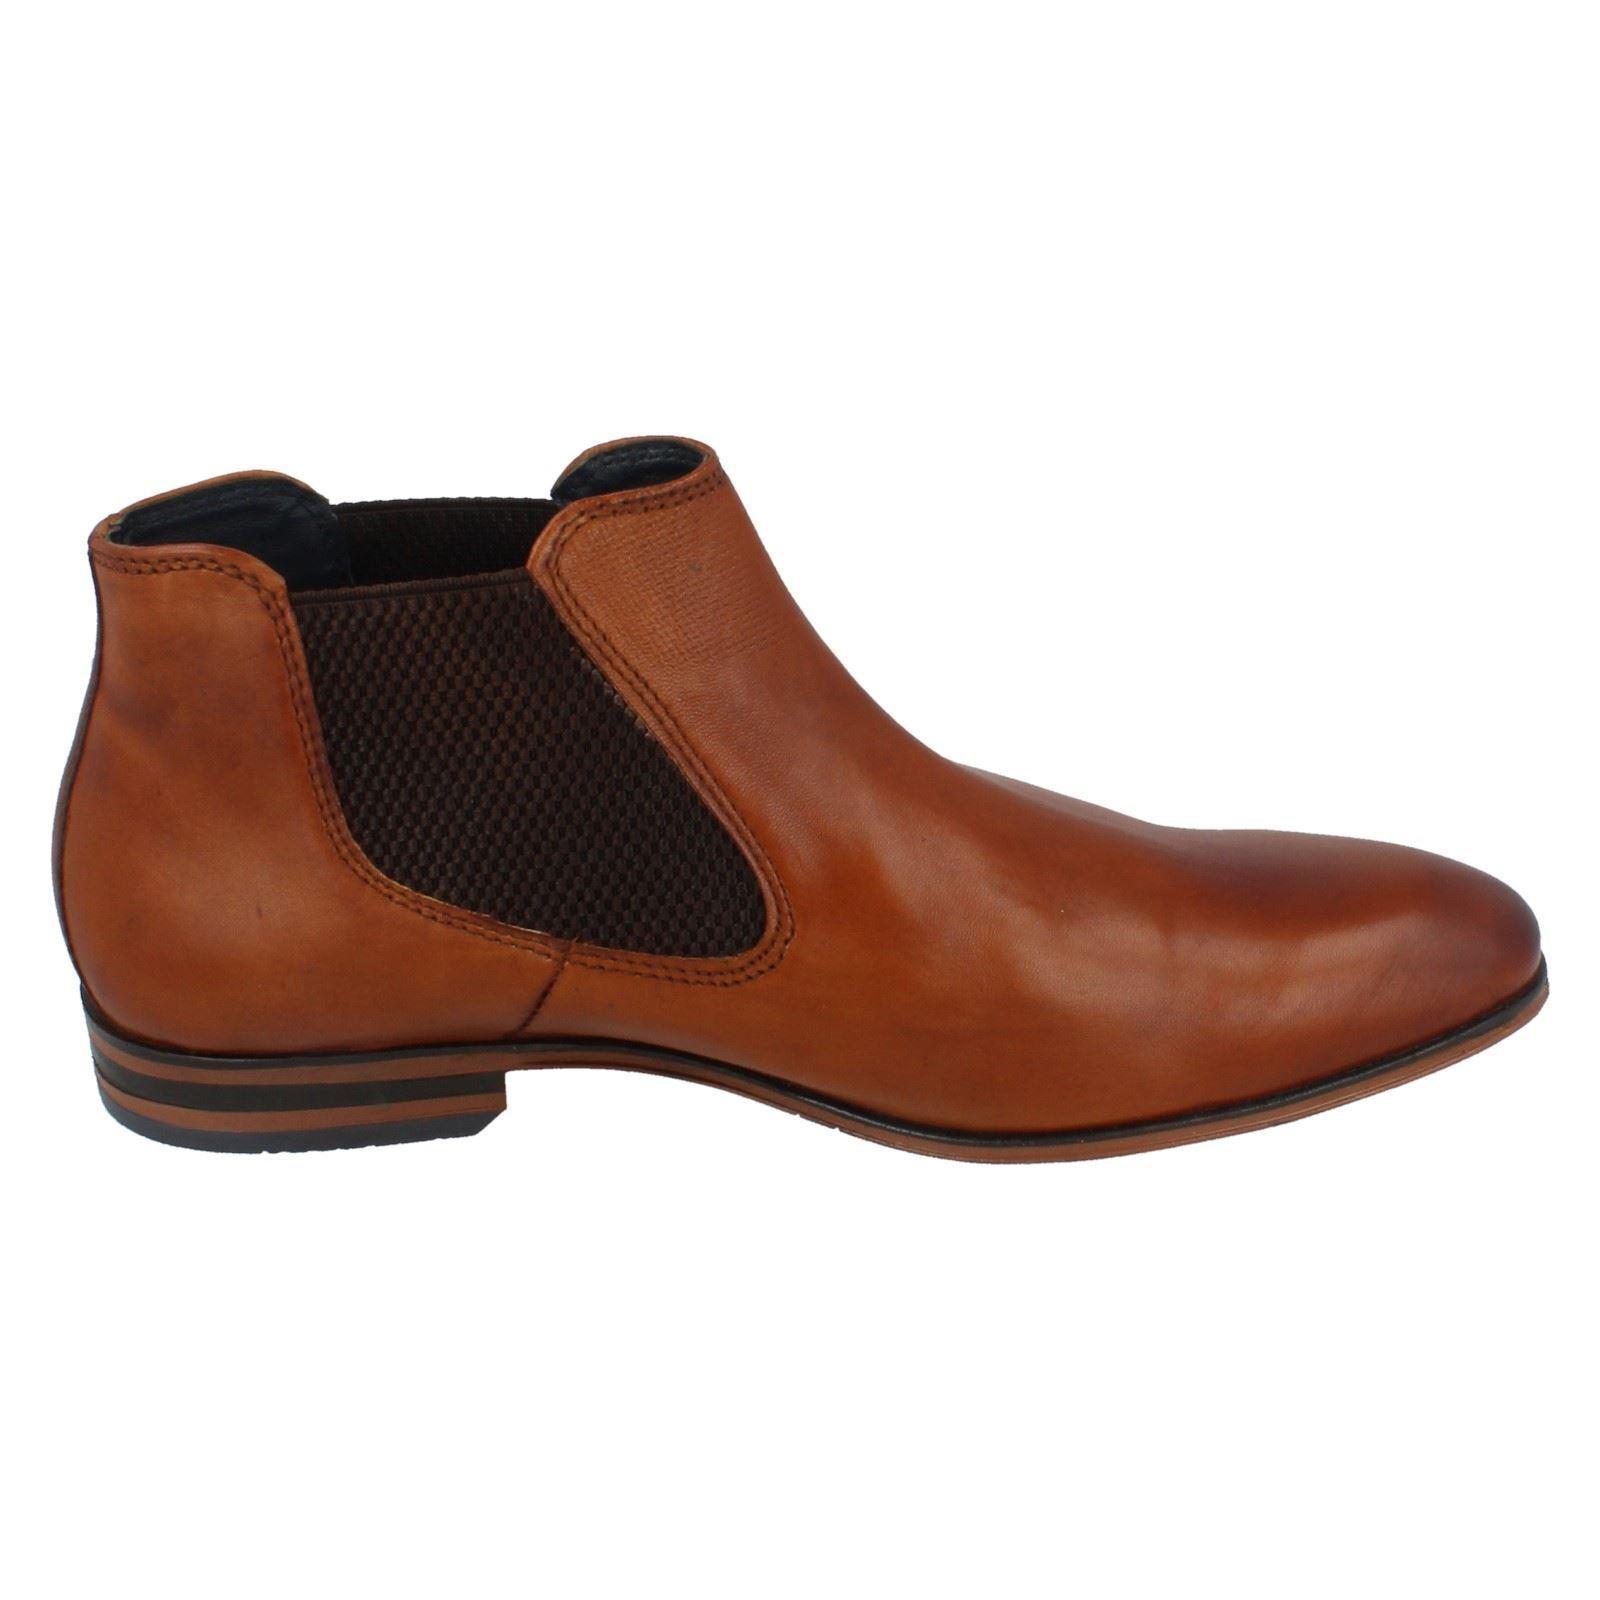 Herren ON BUGATTI 311-10120-4100 FORMAL Schuhe SMART WORK PULL ON Herren LEATHER ANKLE Stiefel 1c26e7